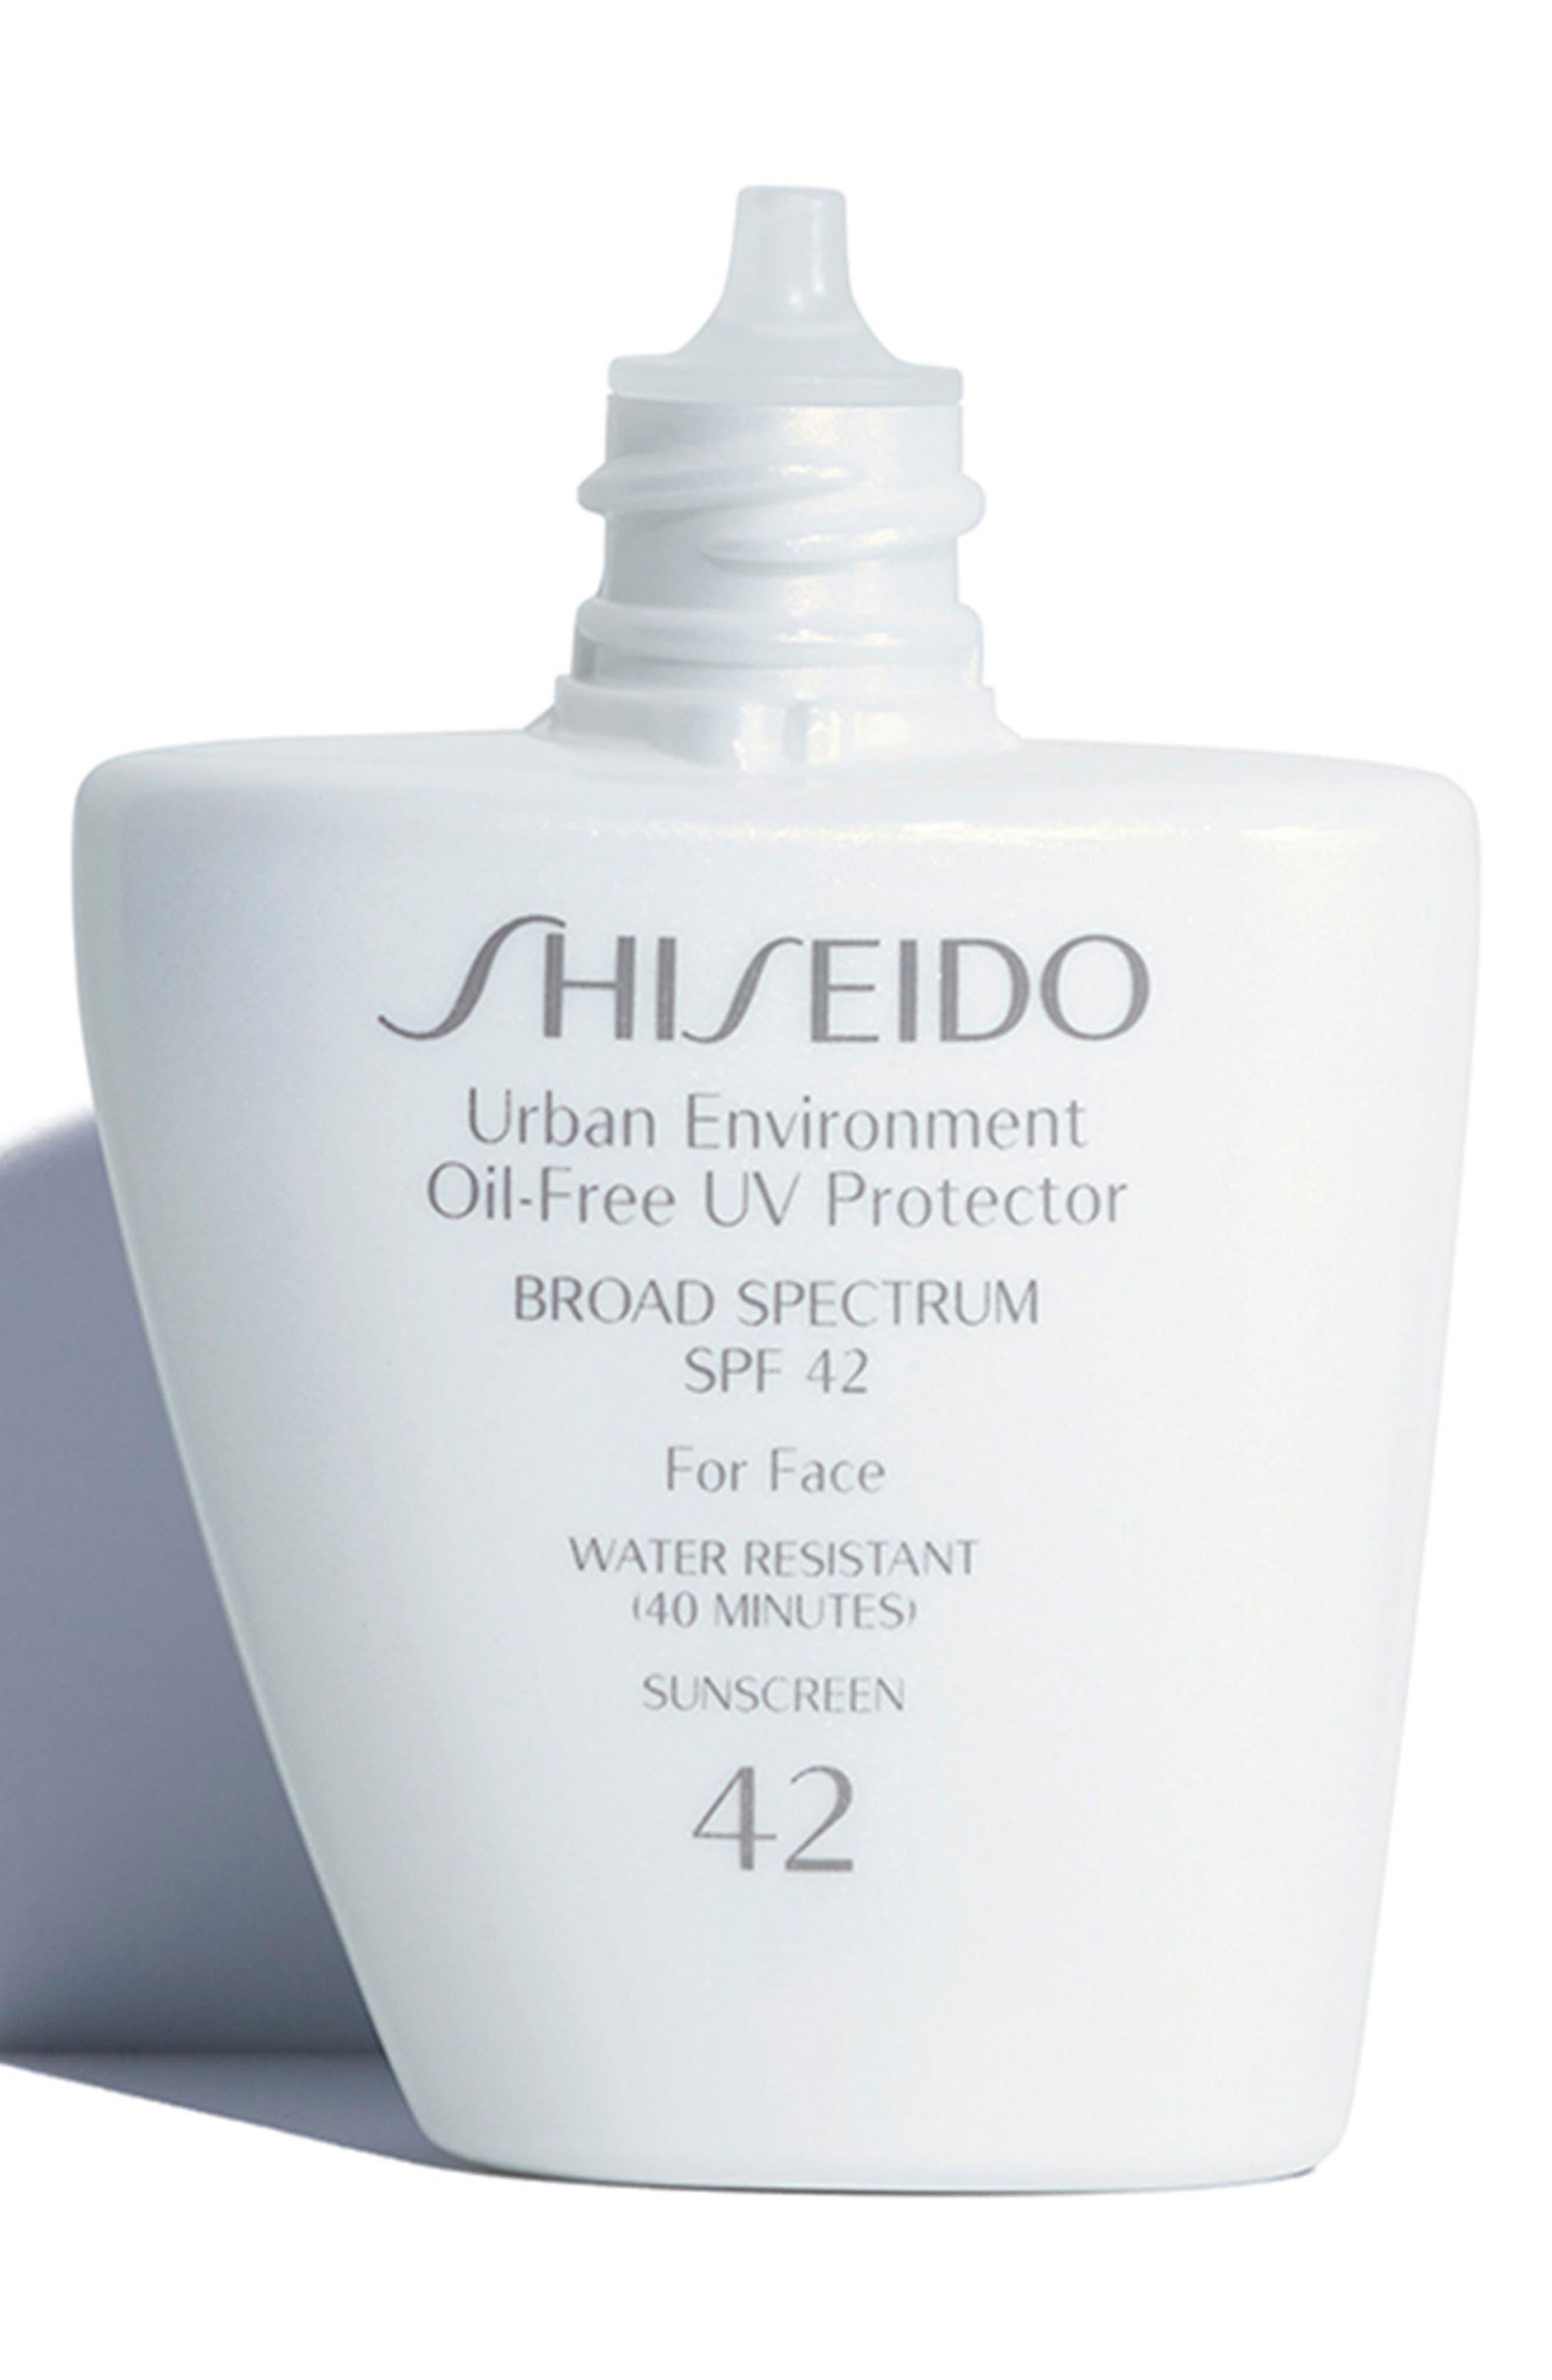 Urban Environment Oil-Free UV Protector Broad Spectrum SPF 42,                             Alternate thumbnail 2, color,                             NO COLOR